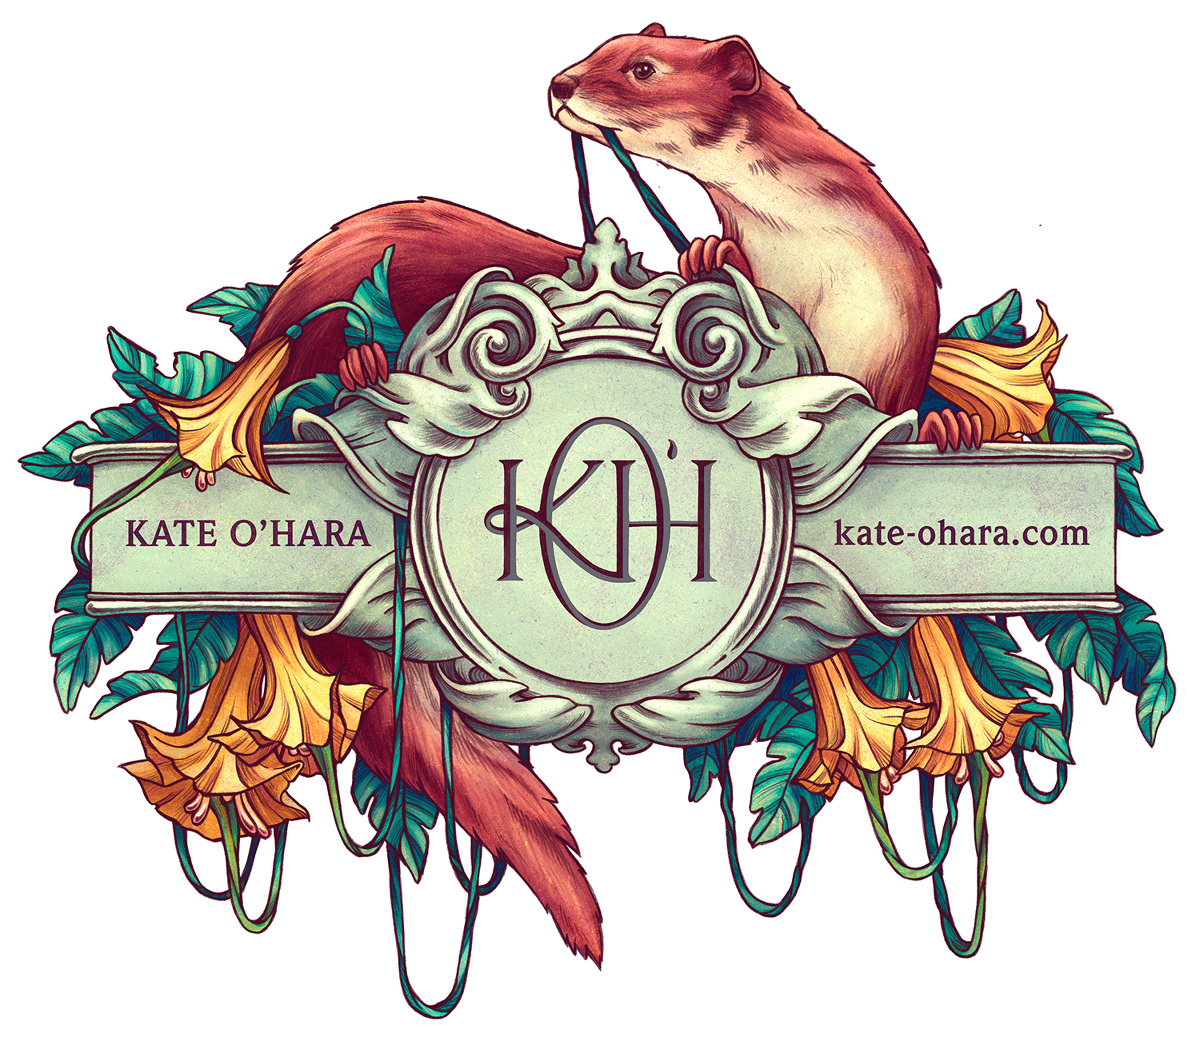 kate-ohara-illustration 9